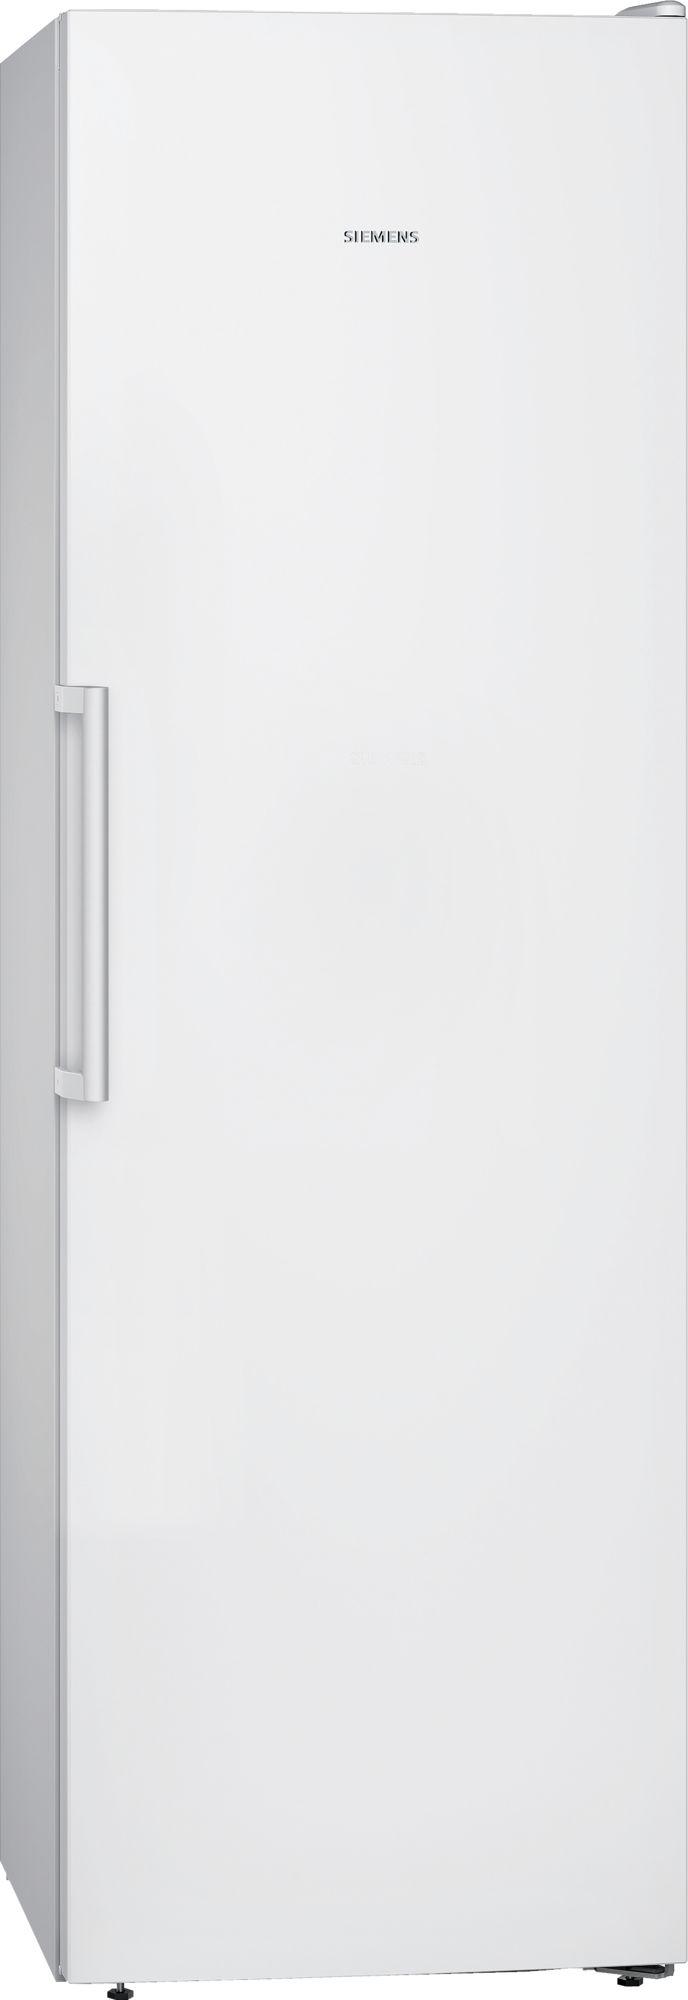 Siemens  iQ300 GS36NVW3PG No Frost Upright Freezer White